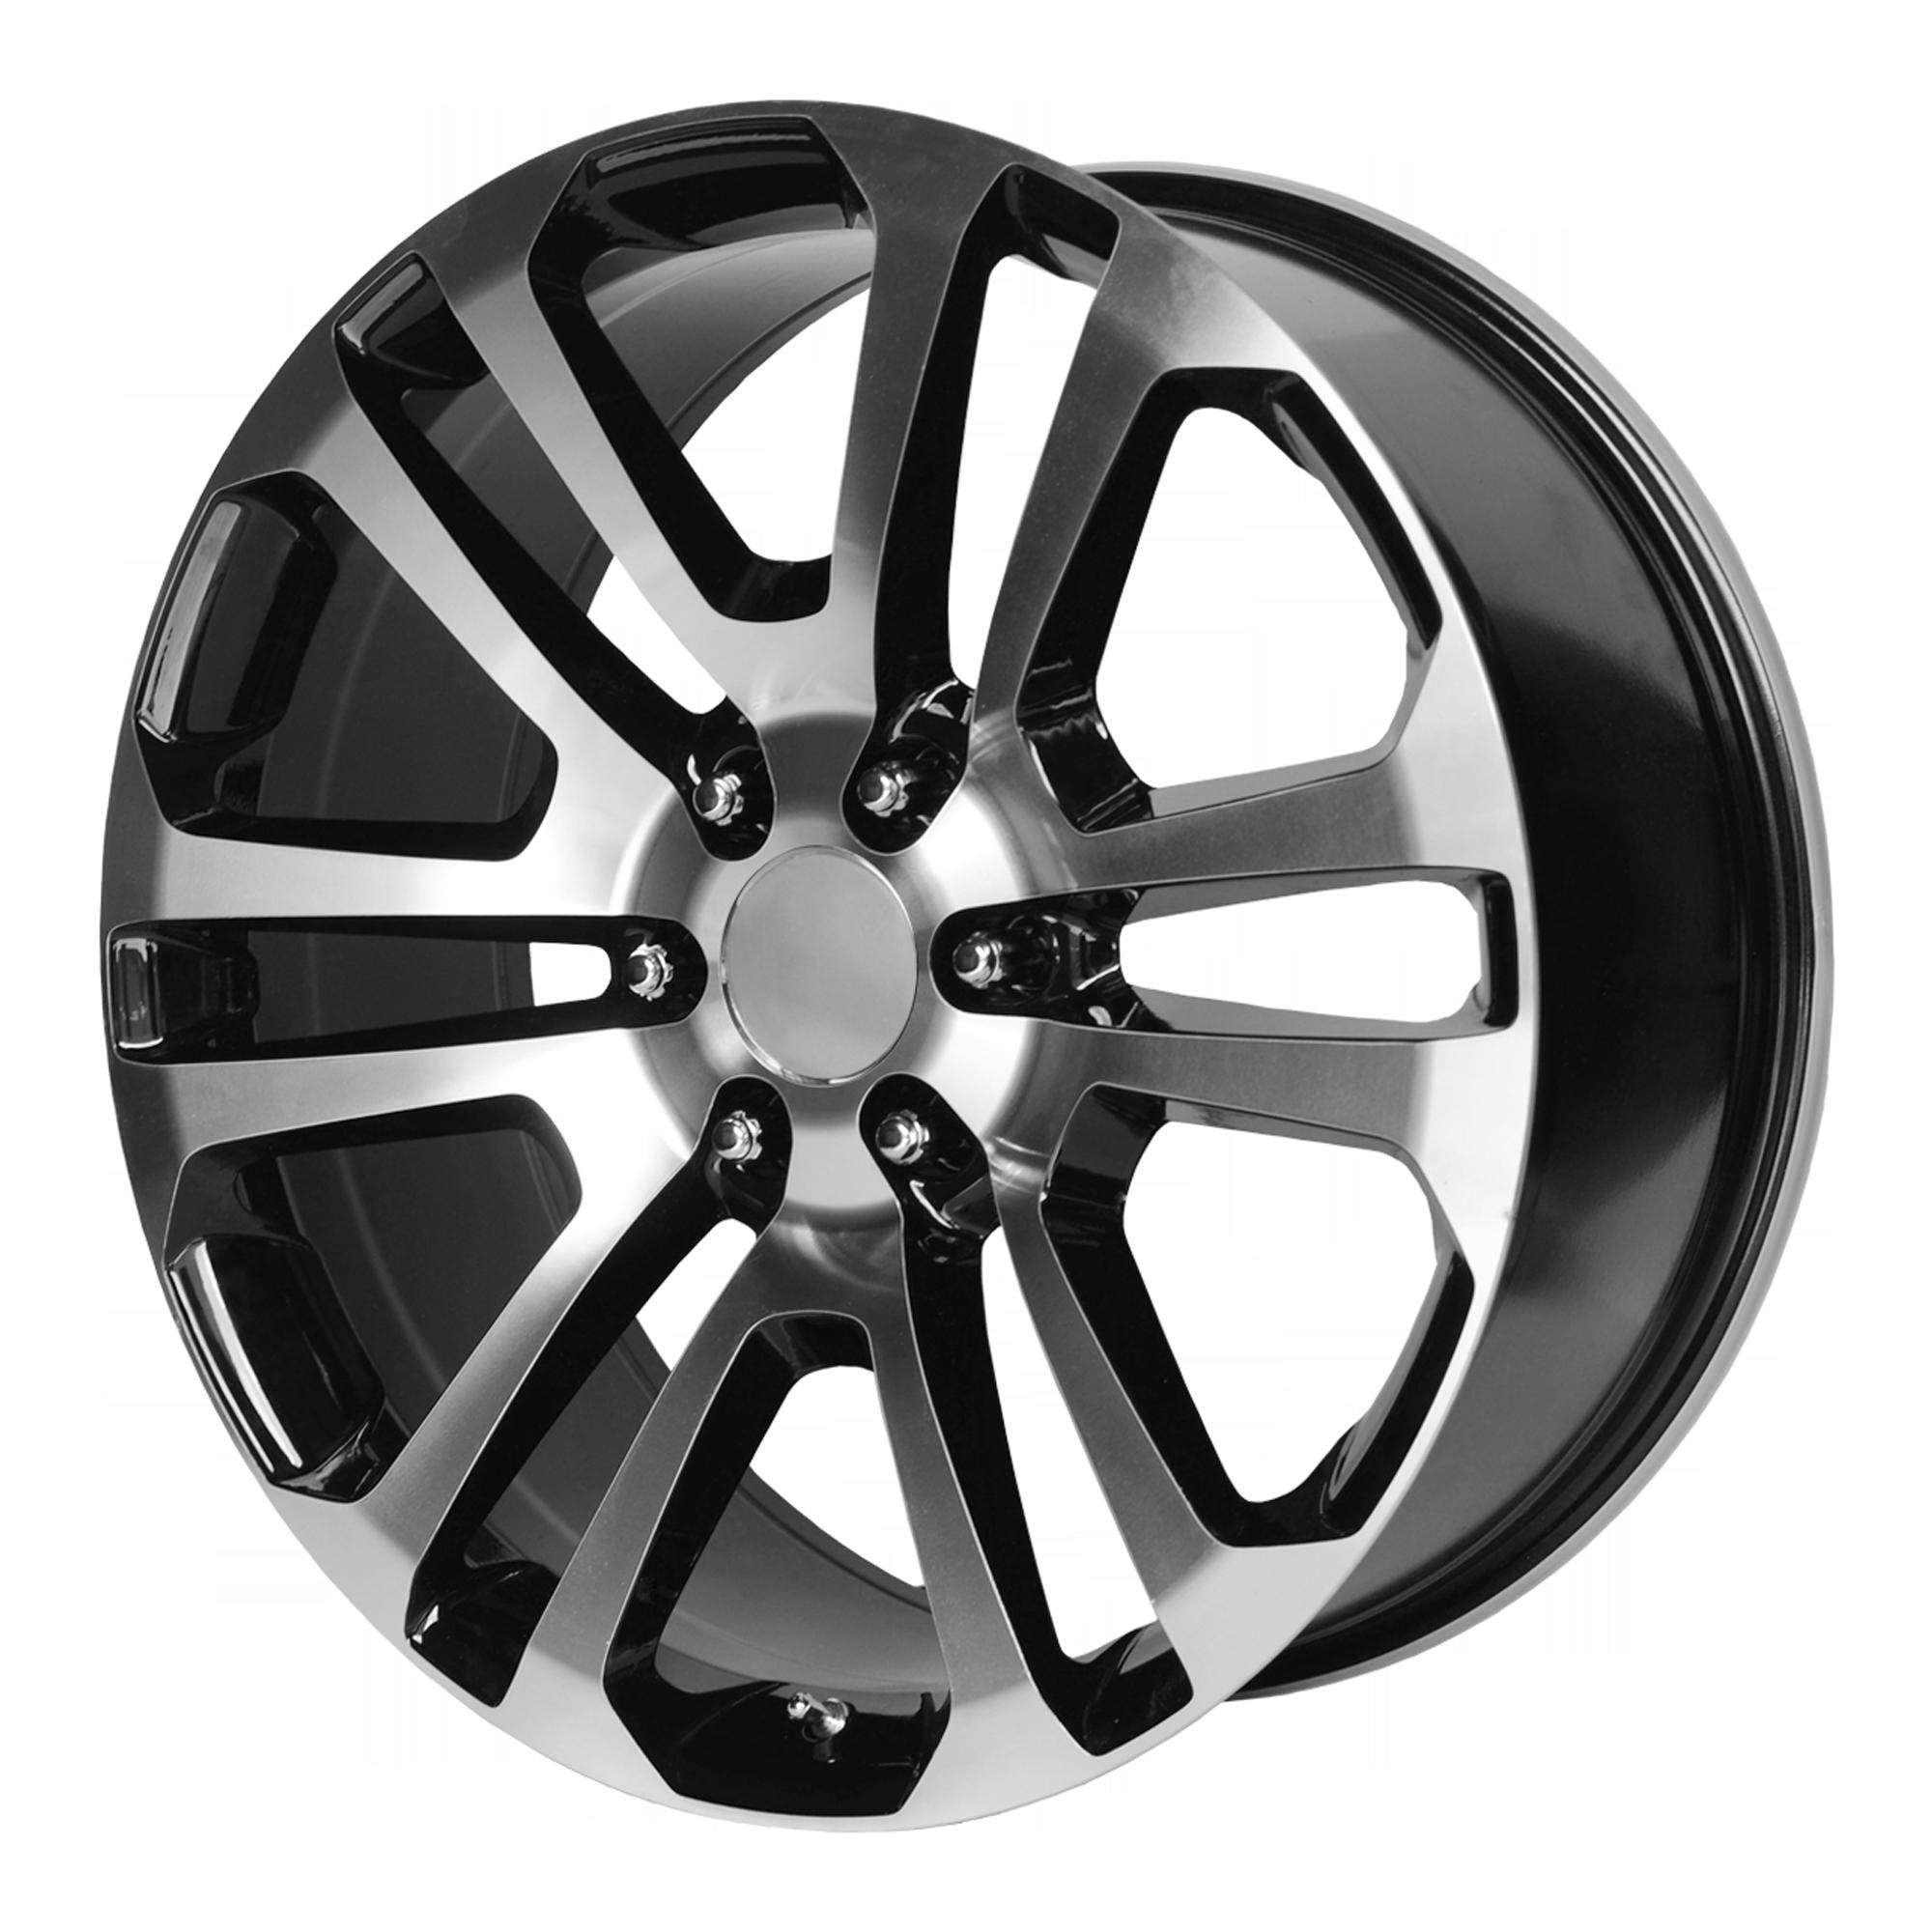 OE Creations Replica Wheels OE Creations PR158 Gloss Black w/ Machined Face